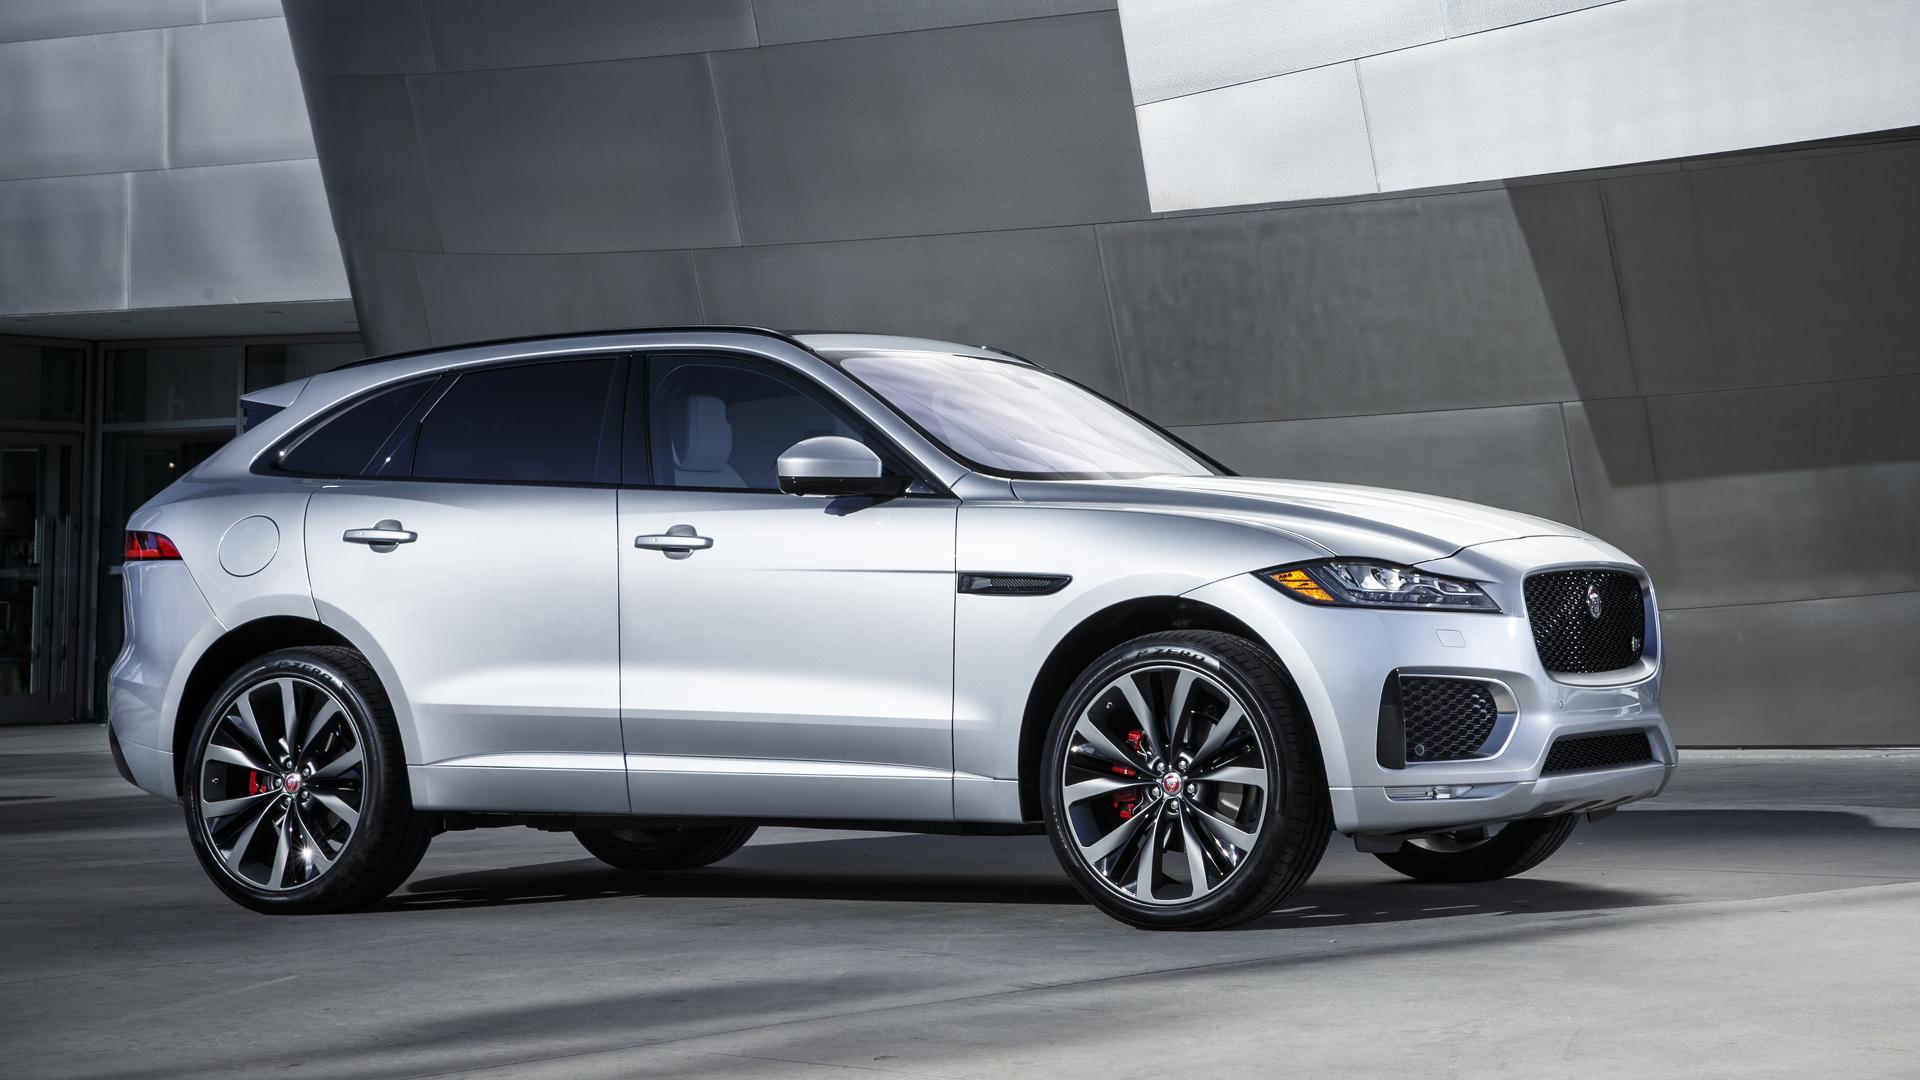 Jaguar F-Pace News and Reviews | Motor1.com